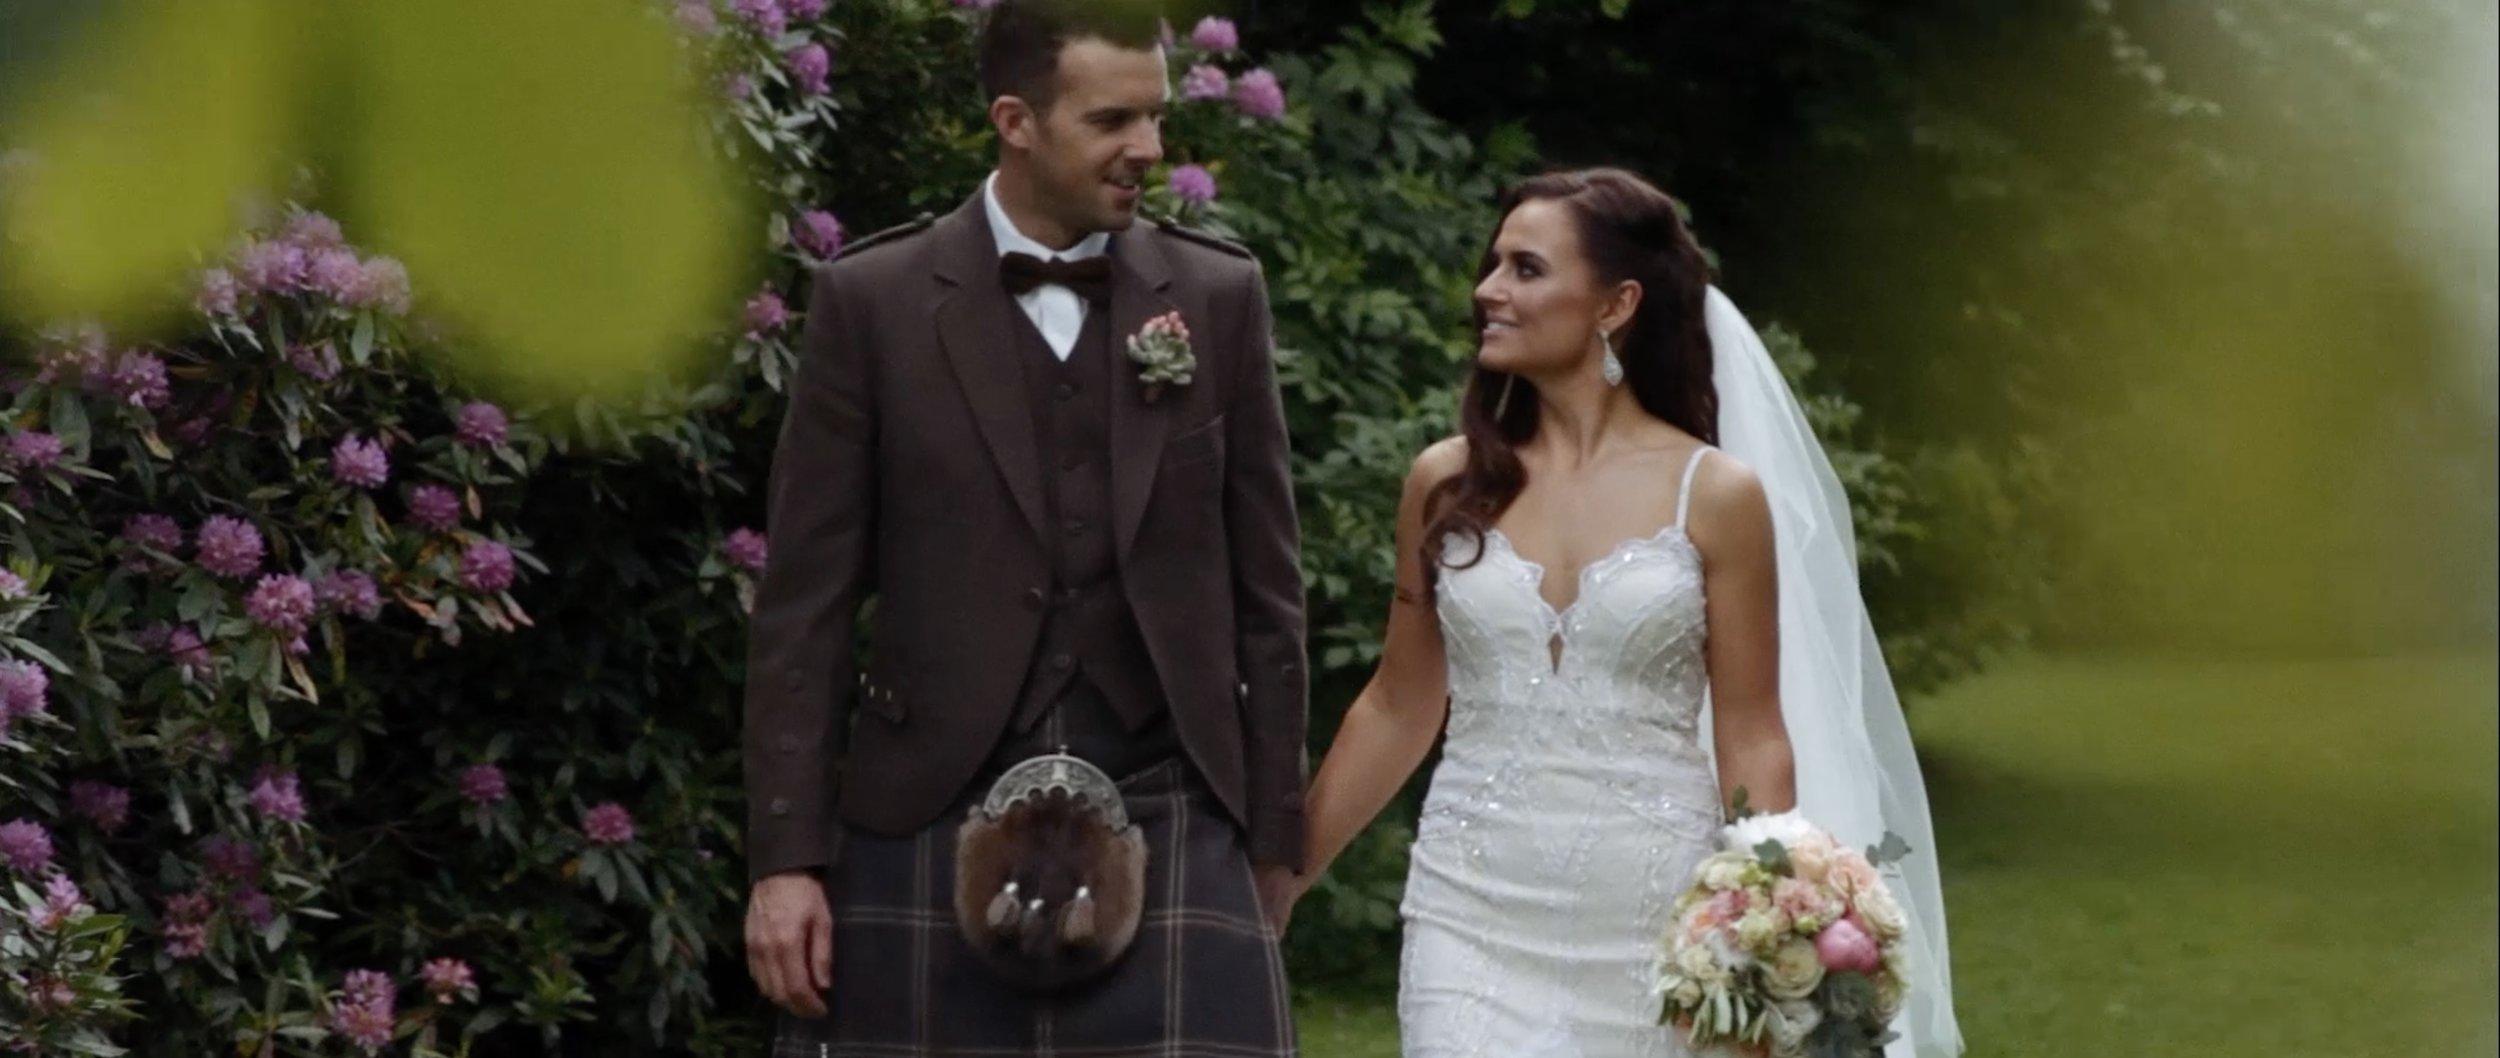 kippilaw-house-wedding-videographer_LL_06.jpg